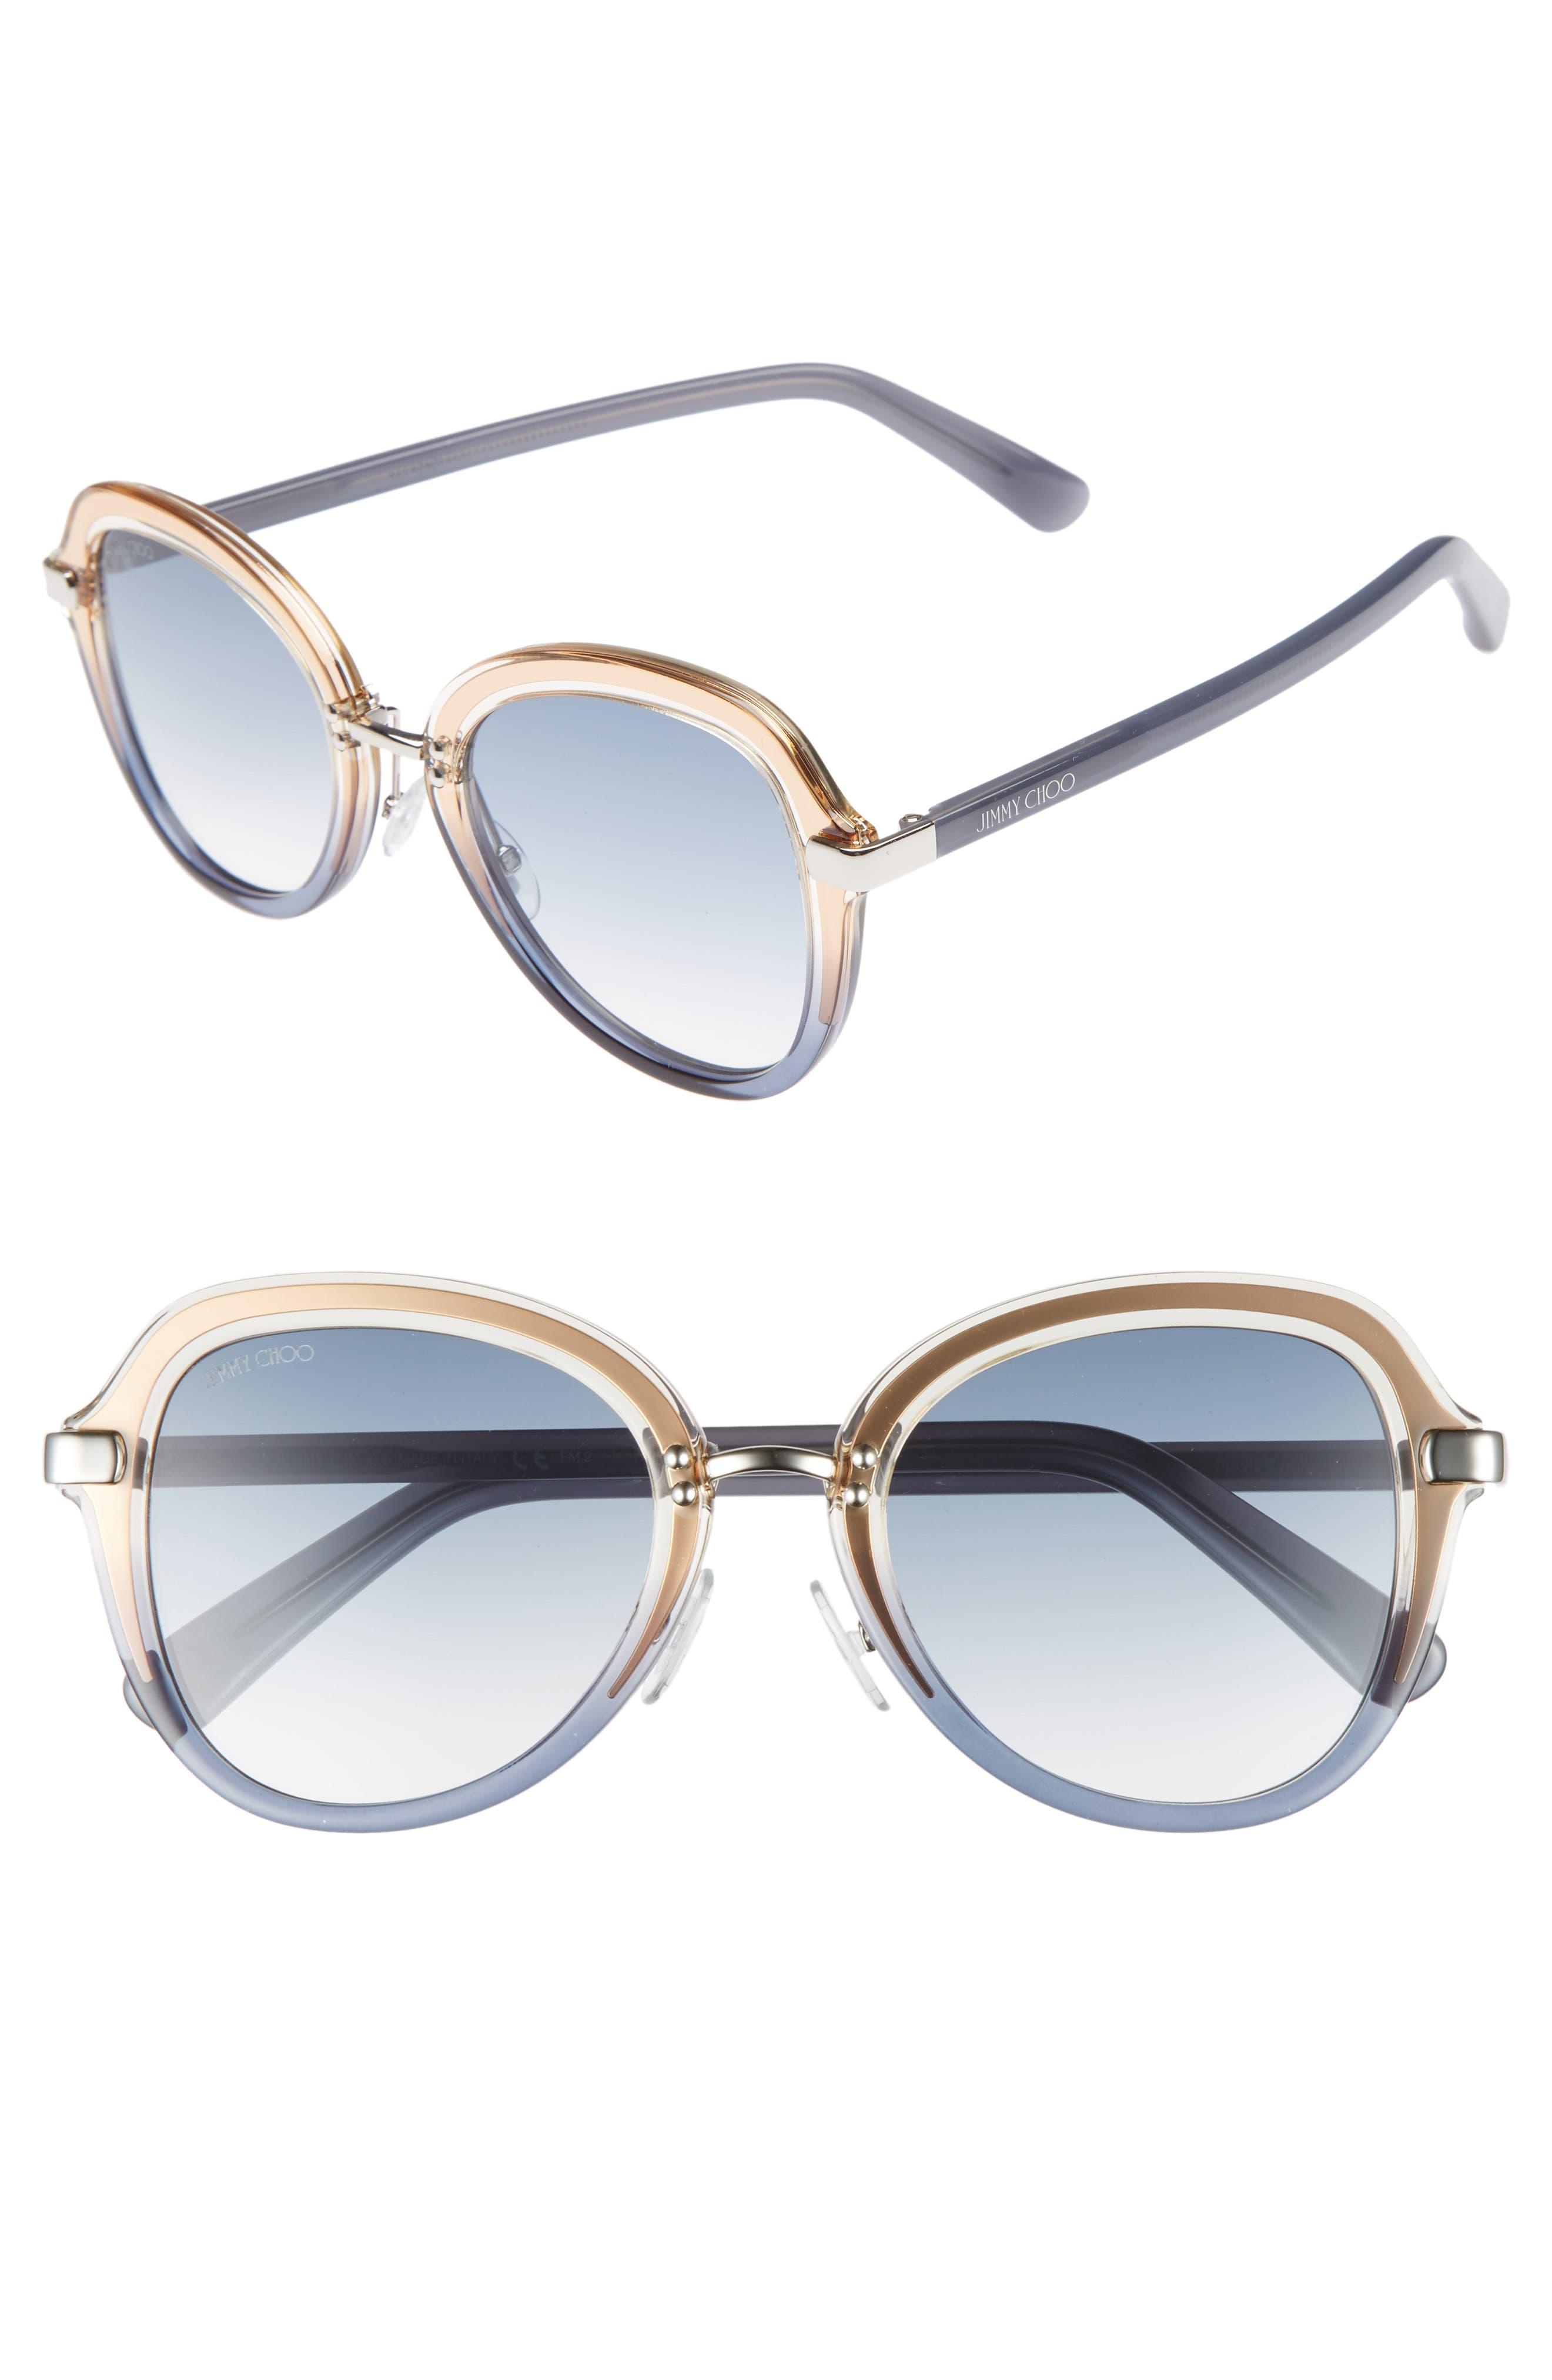 Drees 51mm Gradient Sunglasses,                             Main thumbnail 1, color,                             300